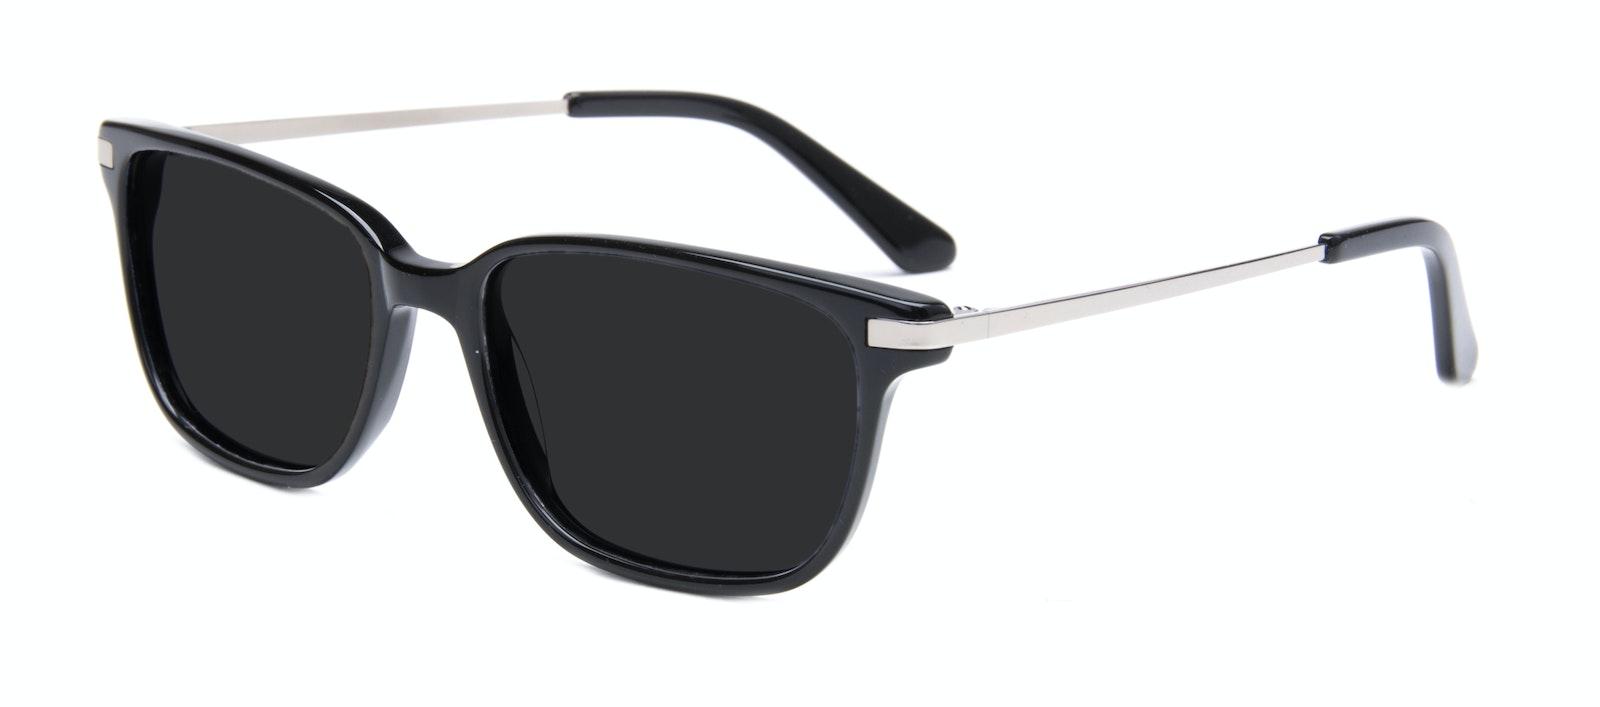 Affordable Fashion Glasses Rectangle Sunglasses Men Trade Black Tilt